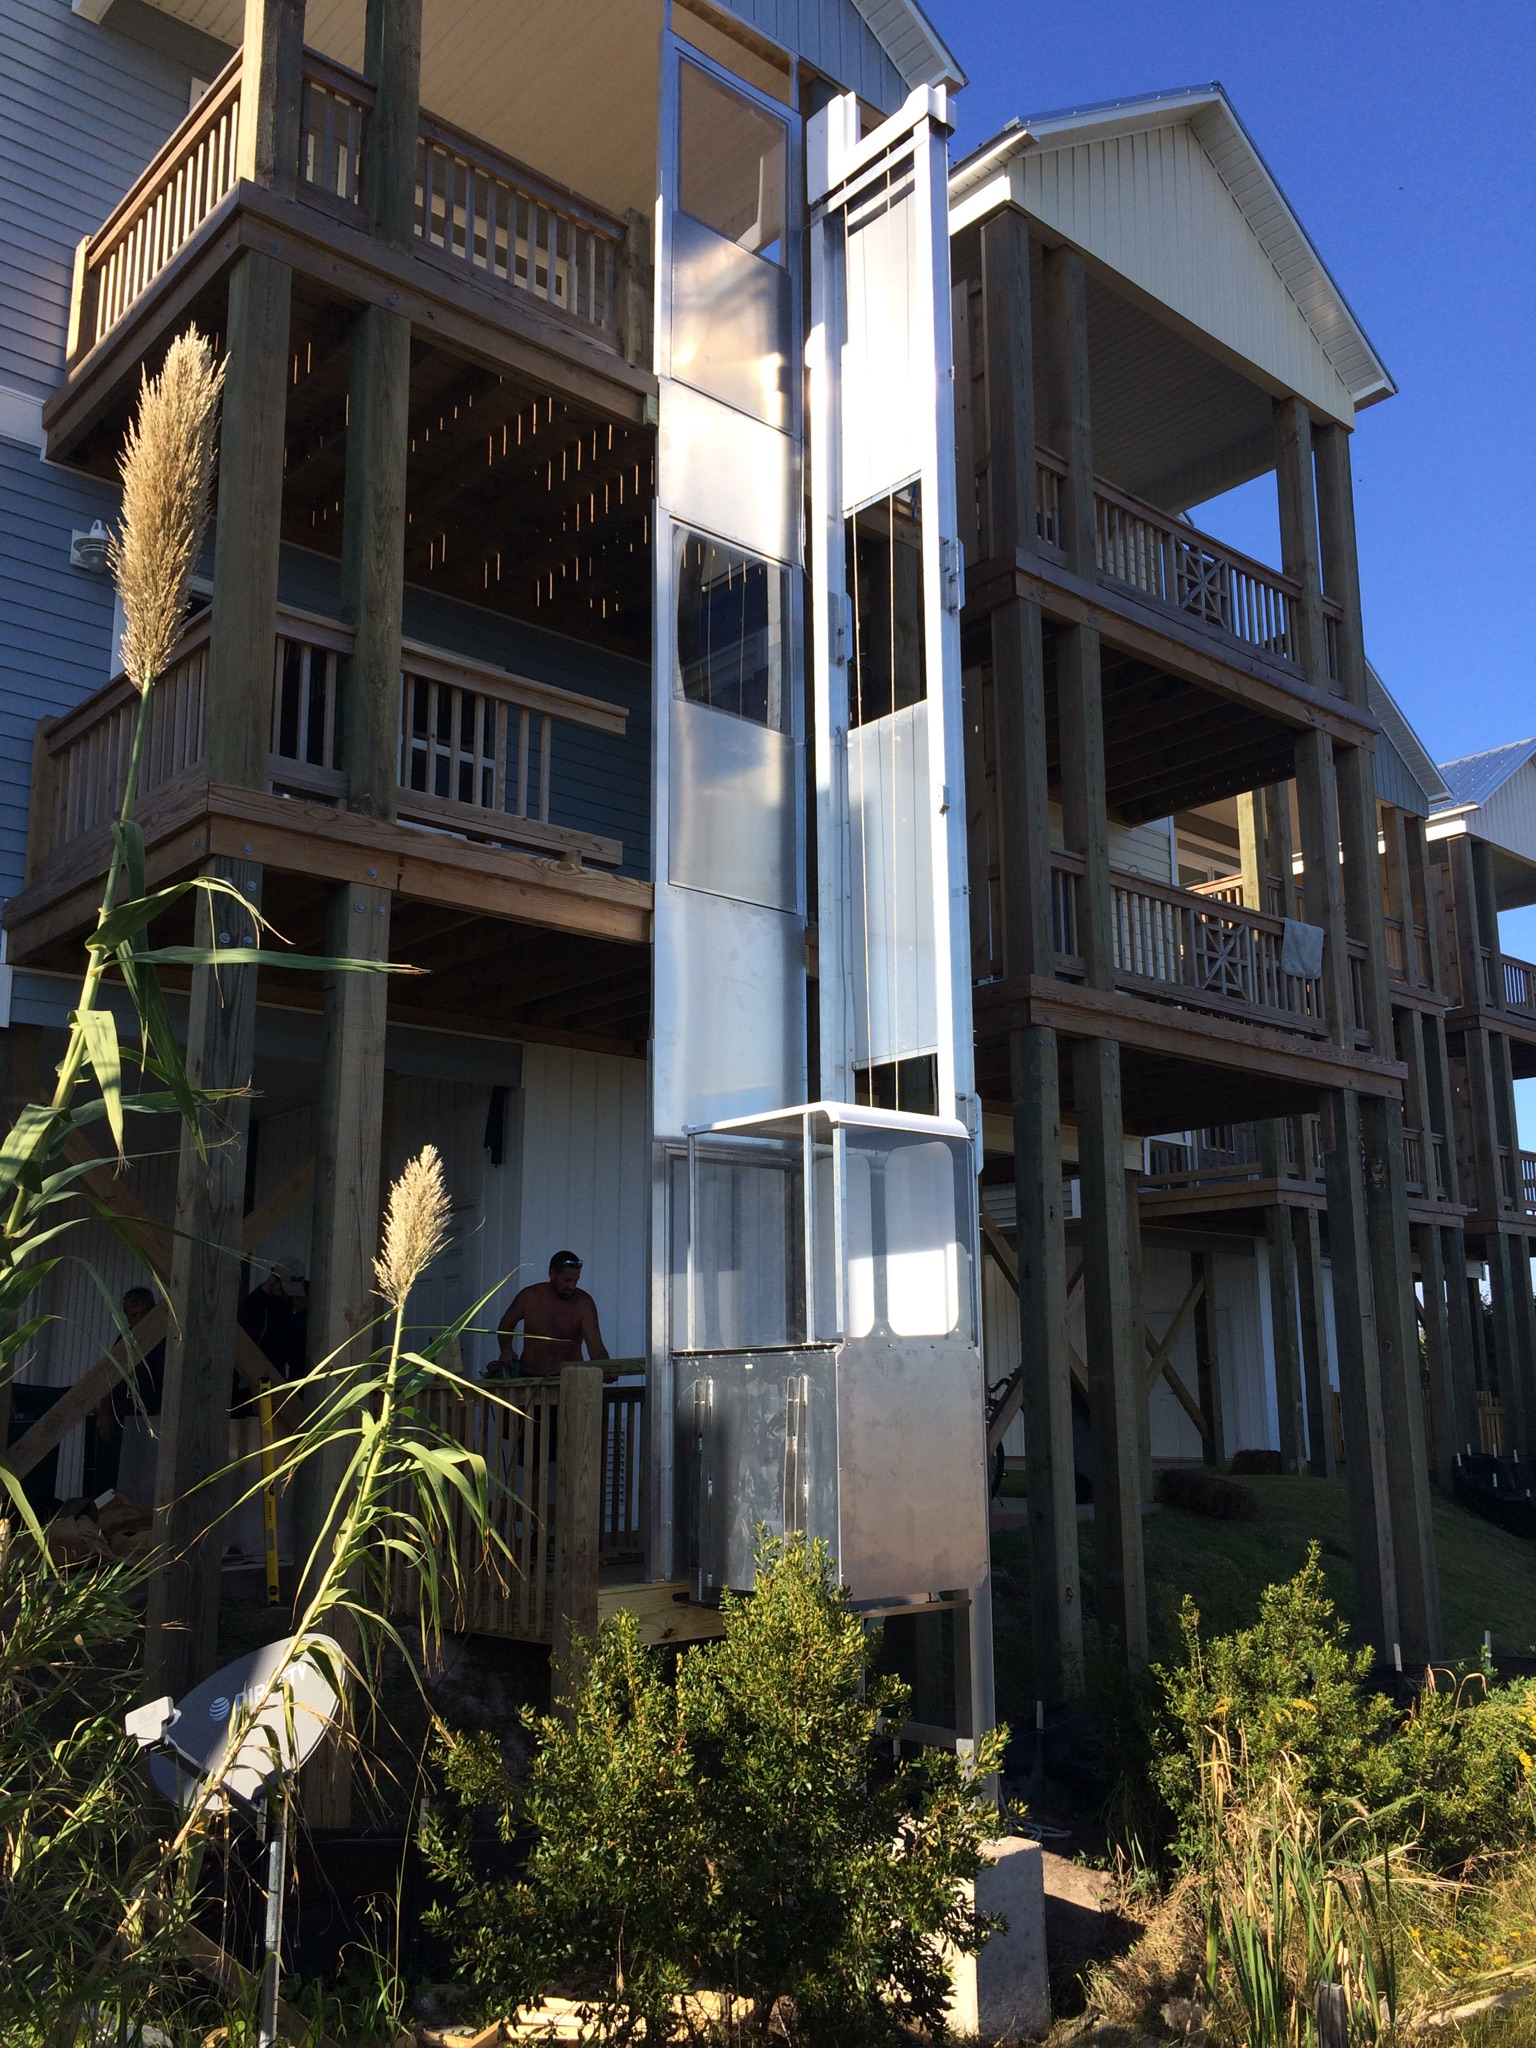 Ameriglide Outdoor Residential Elevator Ameriglide